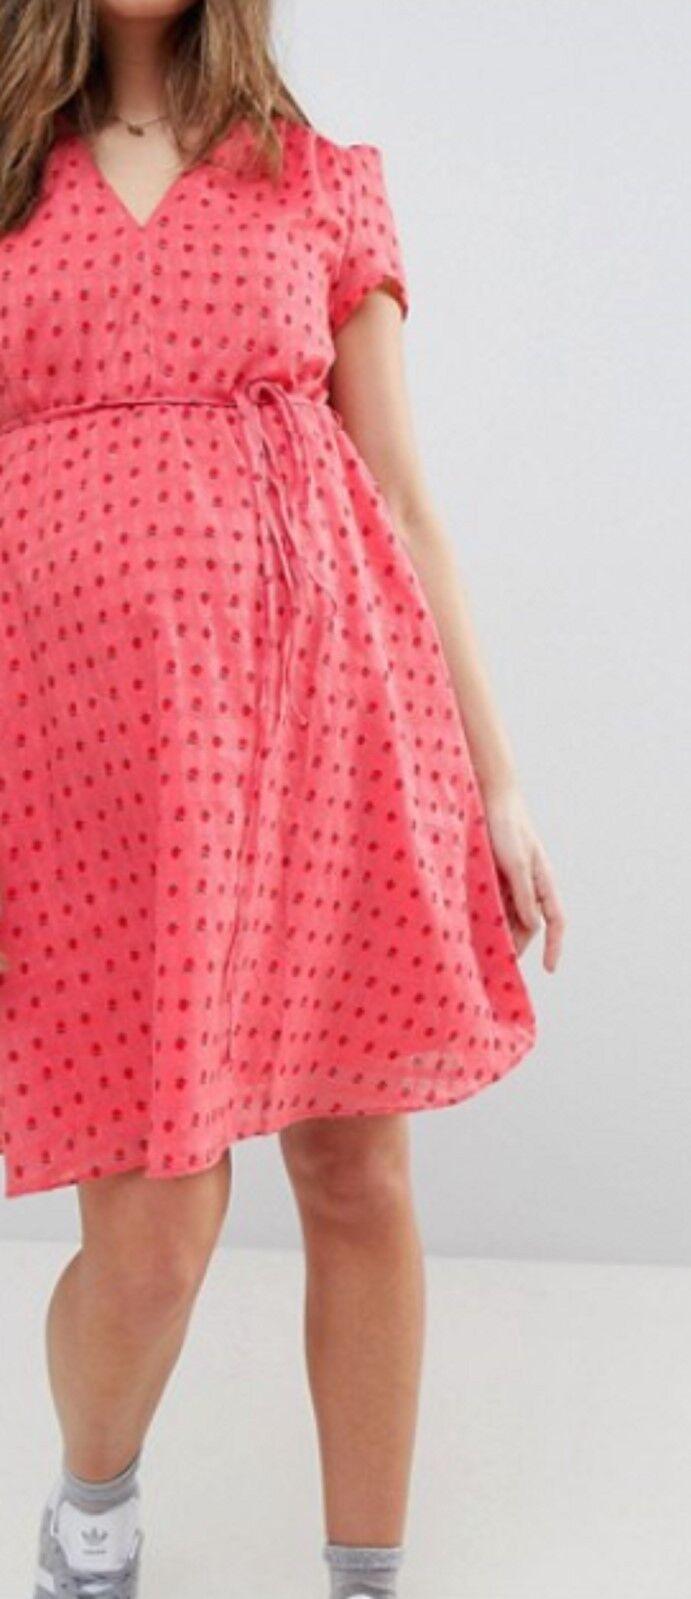 Glamgoldus - Bloom Mini Tea Dress With Tie Waist In Ditsy pink, Brand New